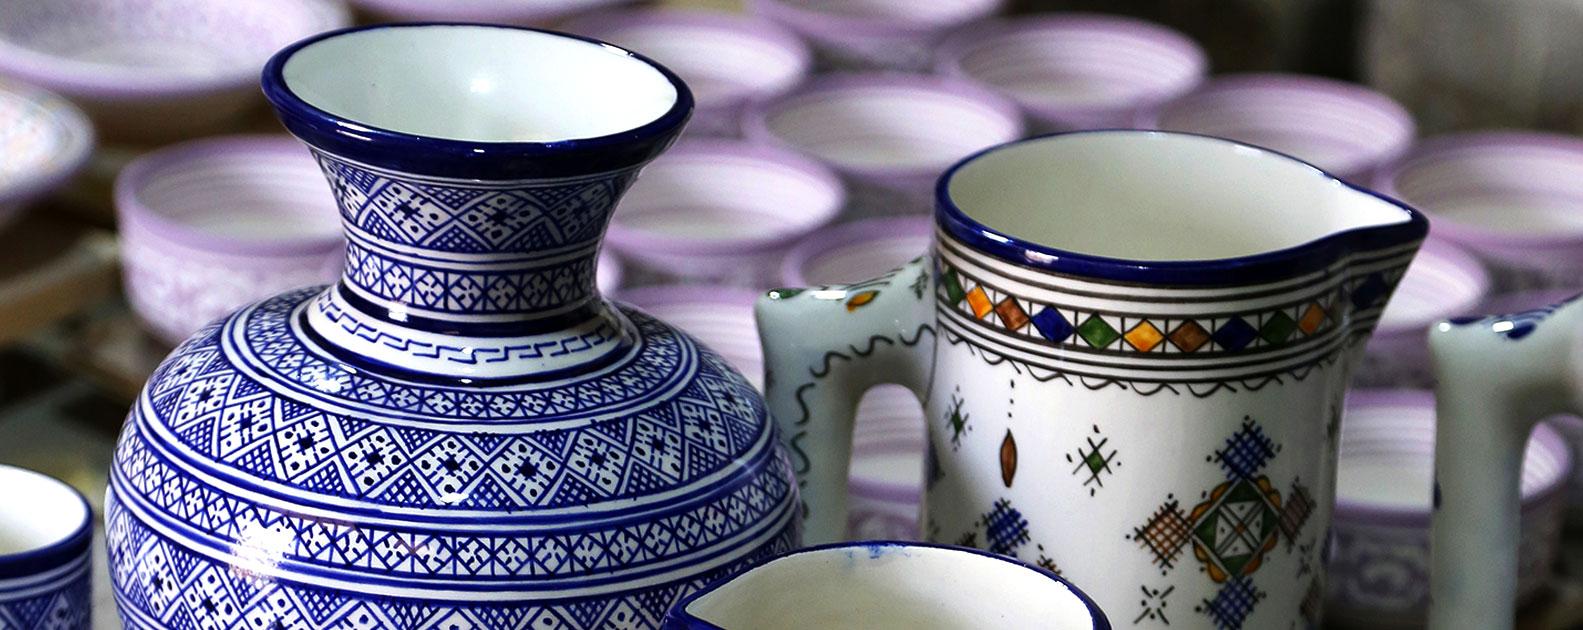 artisanat poterie